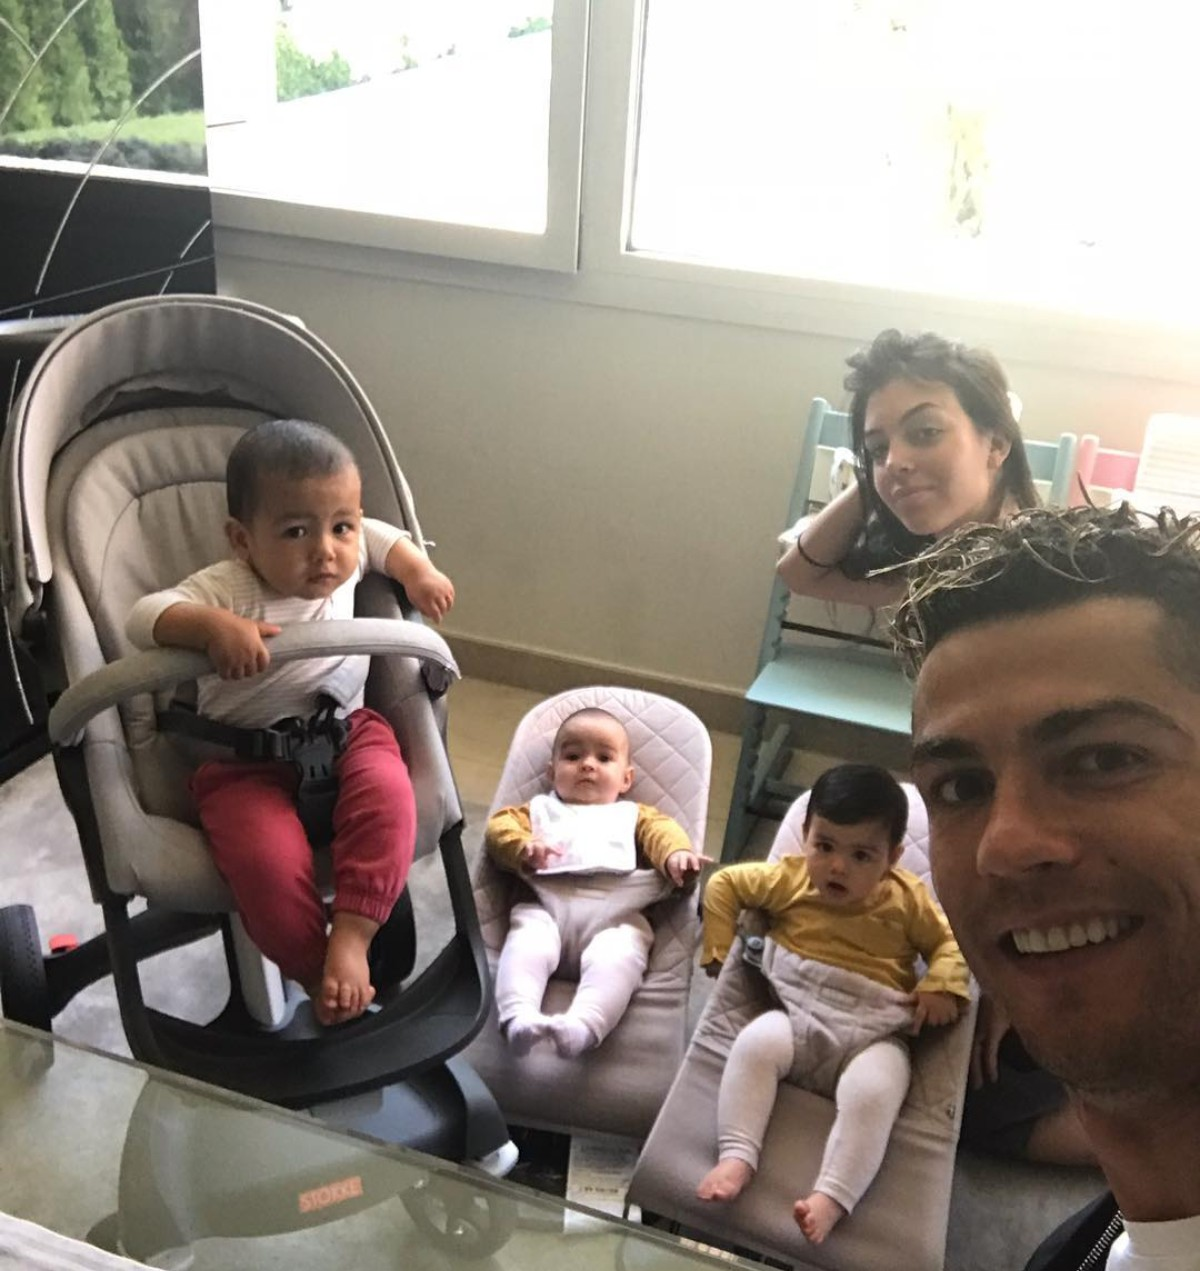 Cristiano Ronaldo With His 3 Babies (2)